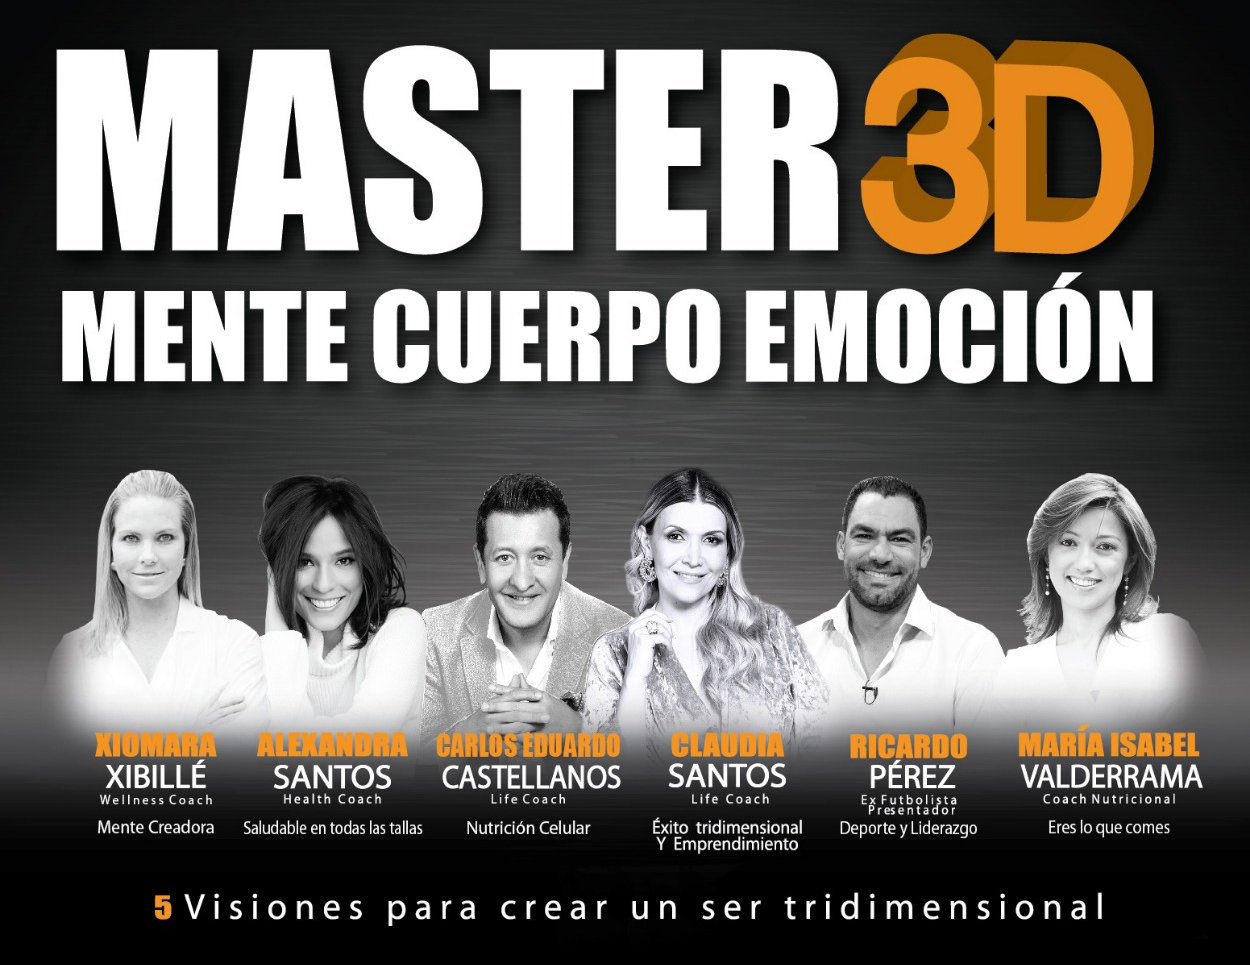 Encabezadomaster3denerro2018